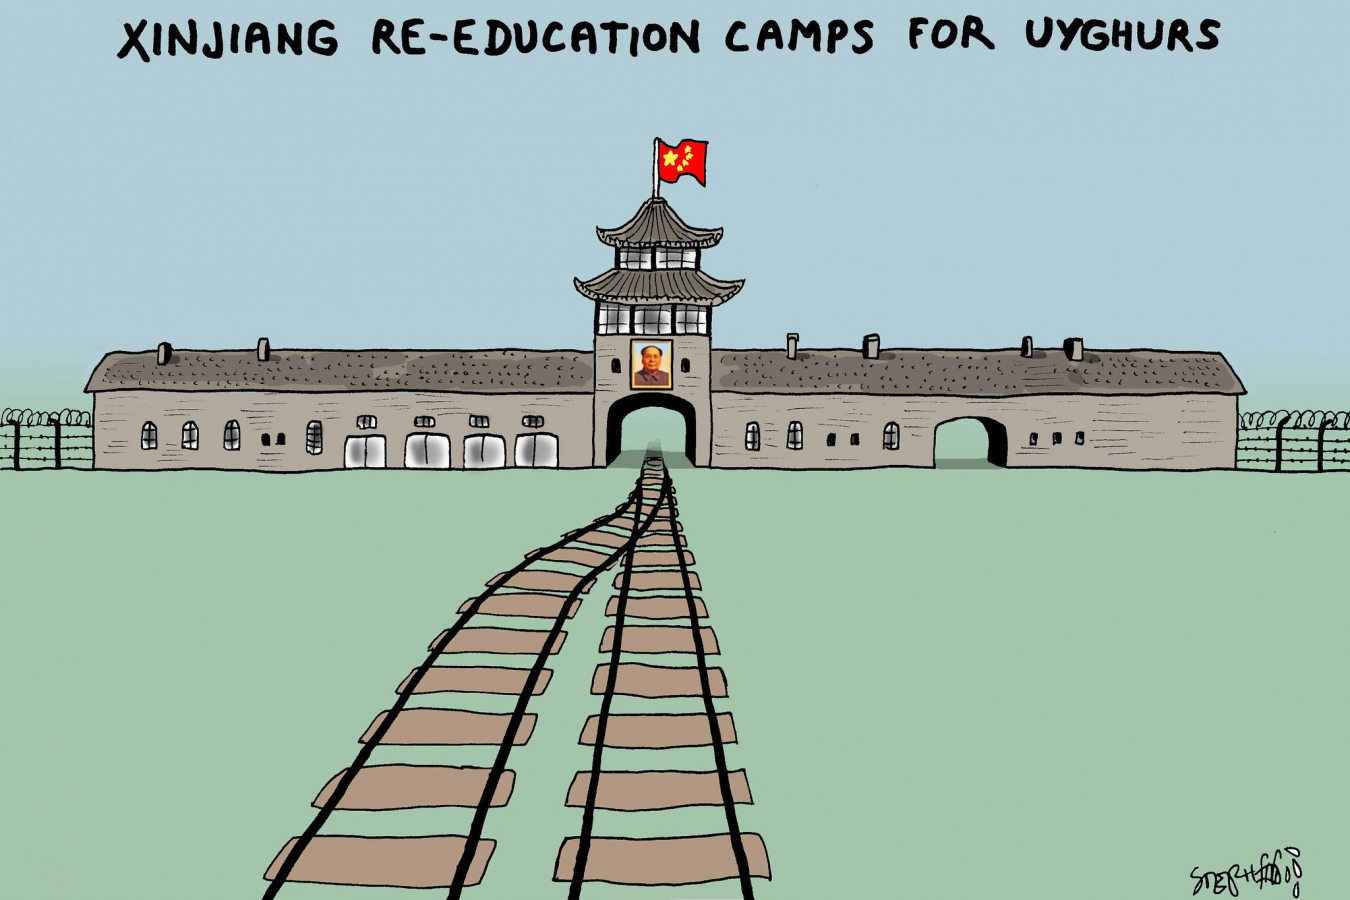 Xinjiang re-education camps: Cartoon by Stephff